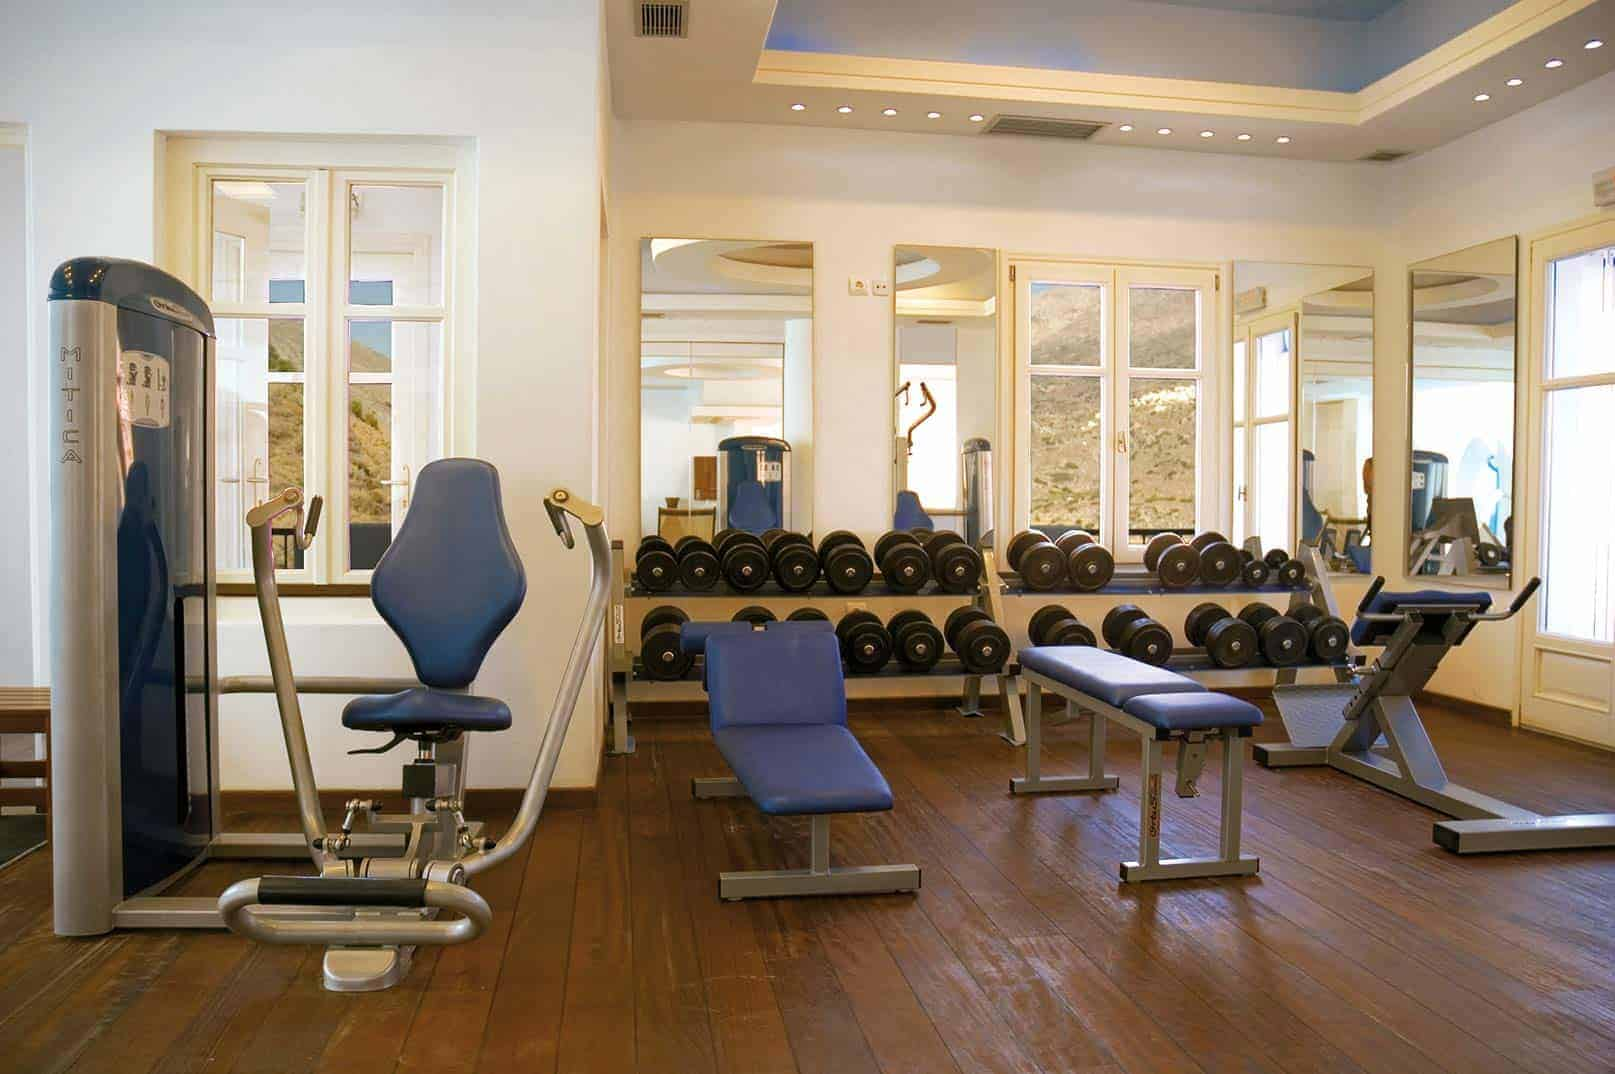 Fitness Center Room1